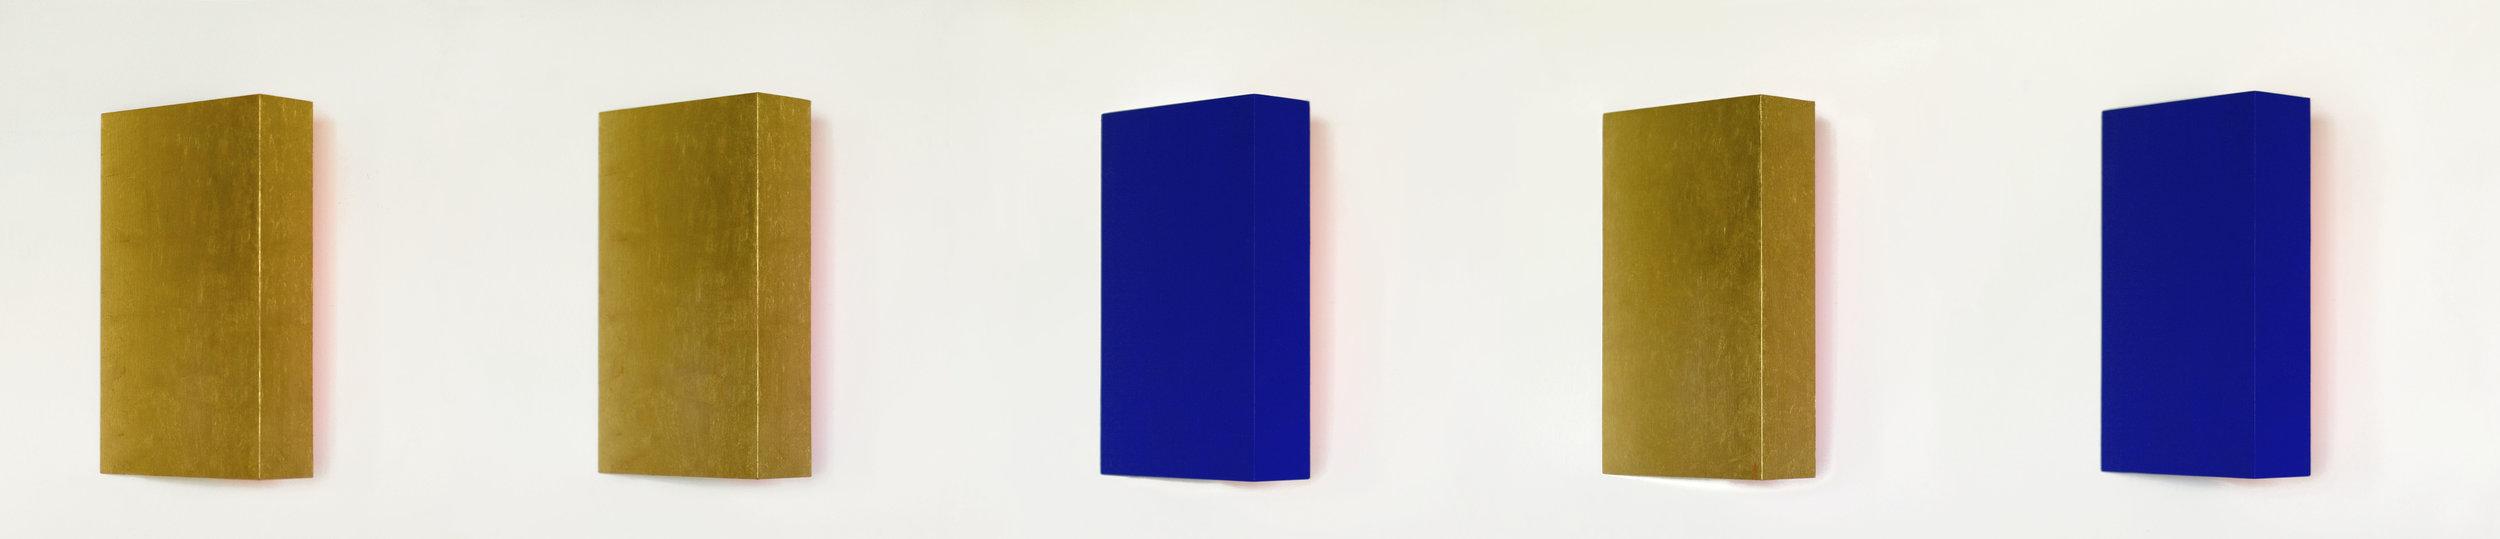 akril, pozlata, les, petkrat 40 x 250 cm, 2002